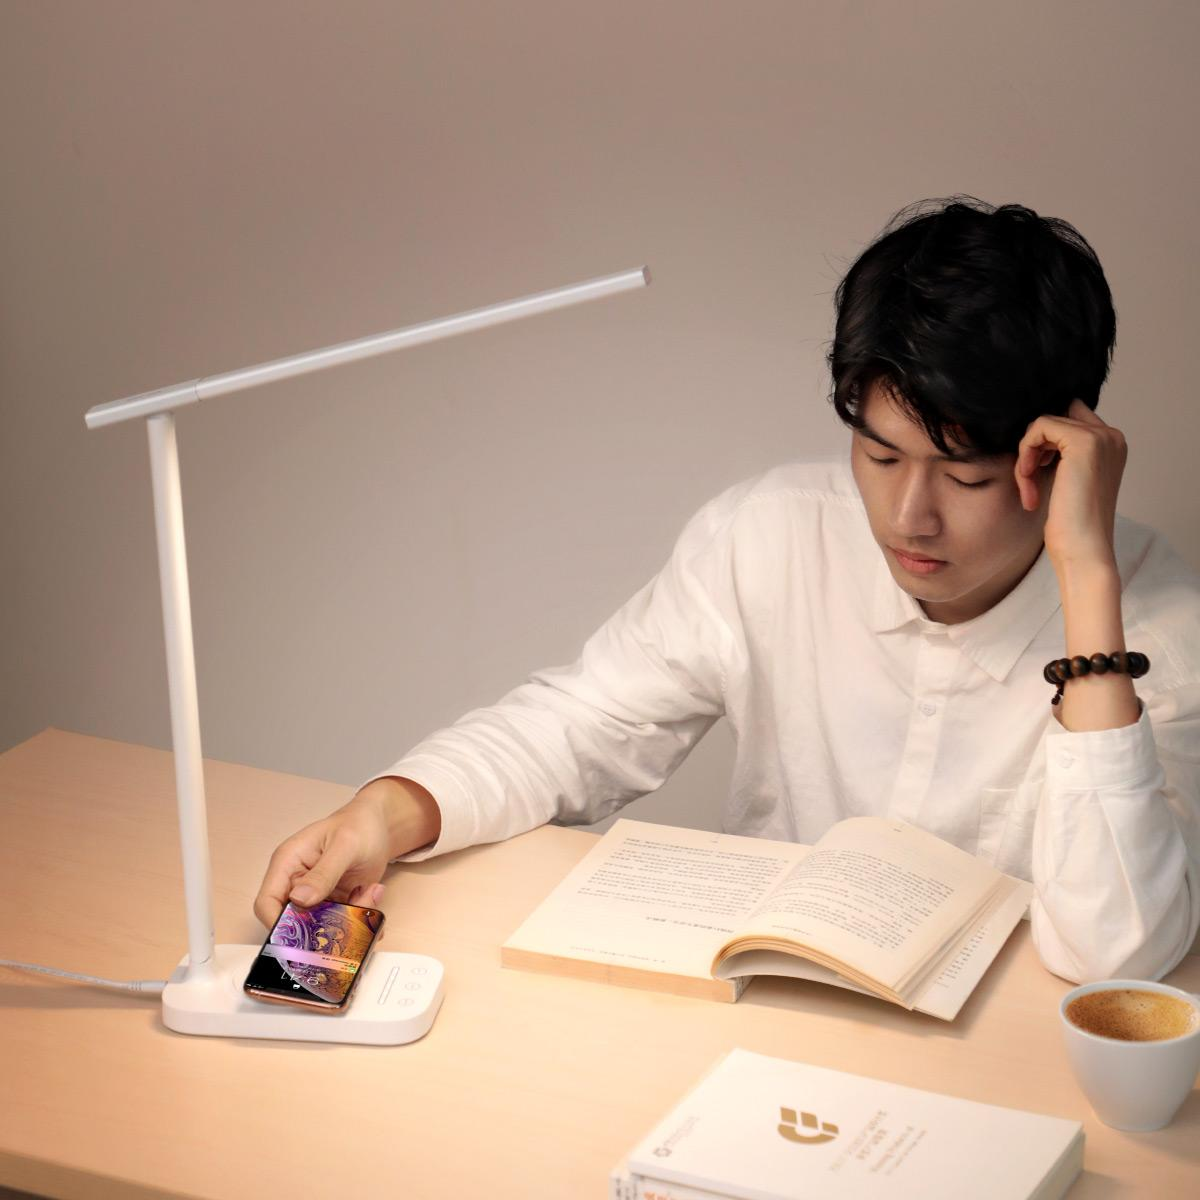 Luminária De Mesa Touch C/ Carregador Sem Fio QI Turbo Baseus Iphone Samsung Xiaomi Huawei LG Motorola